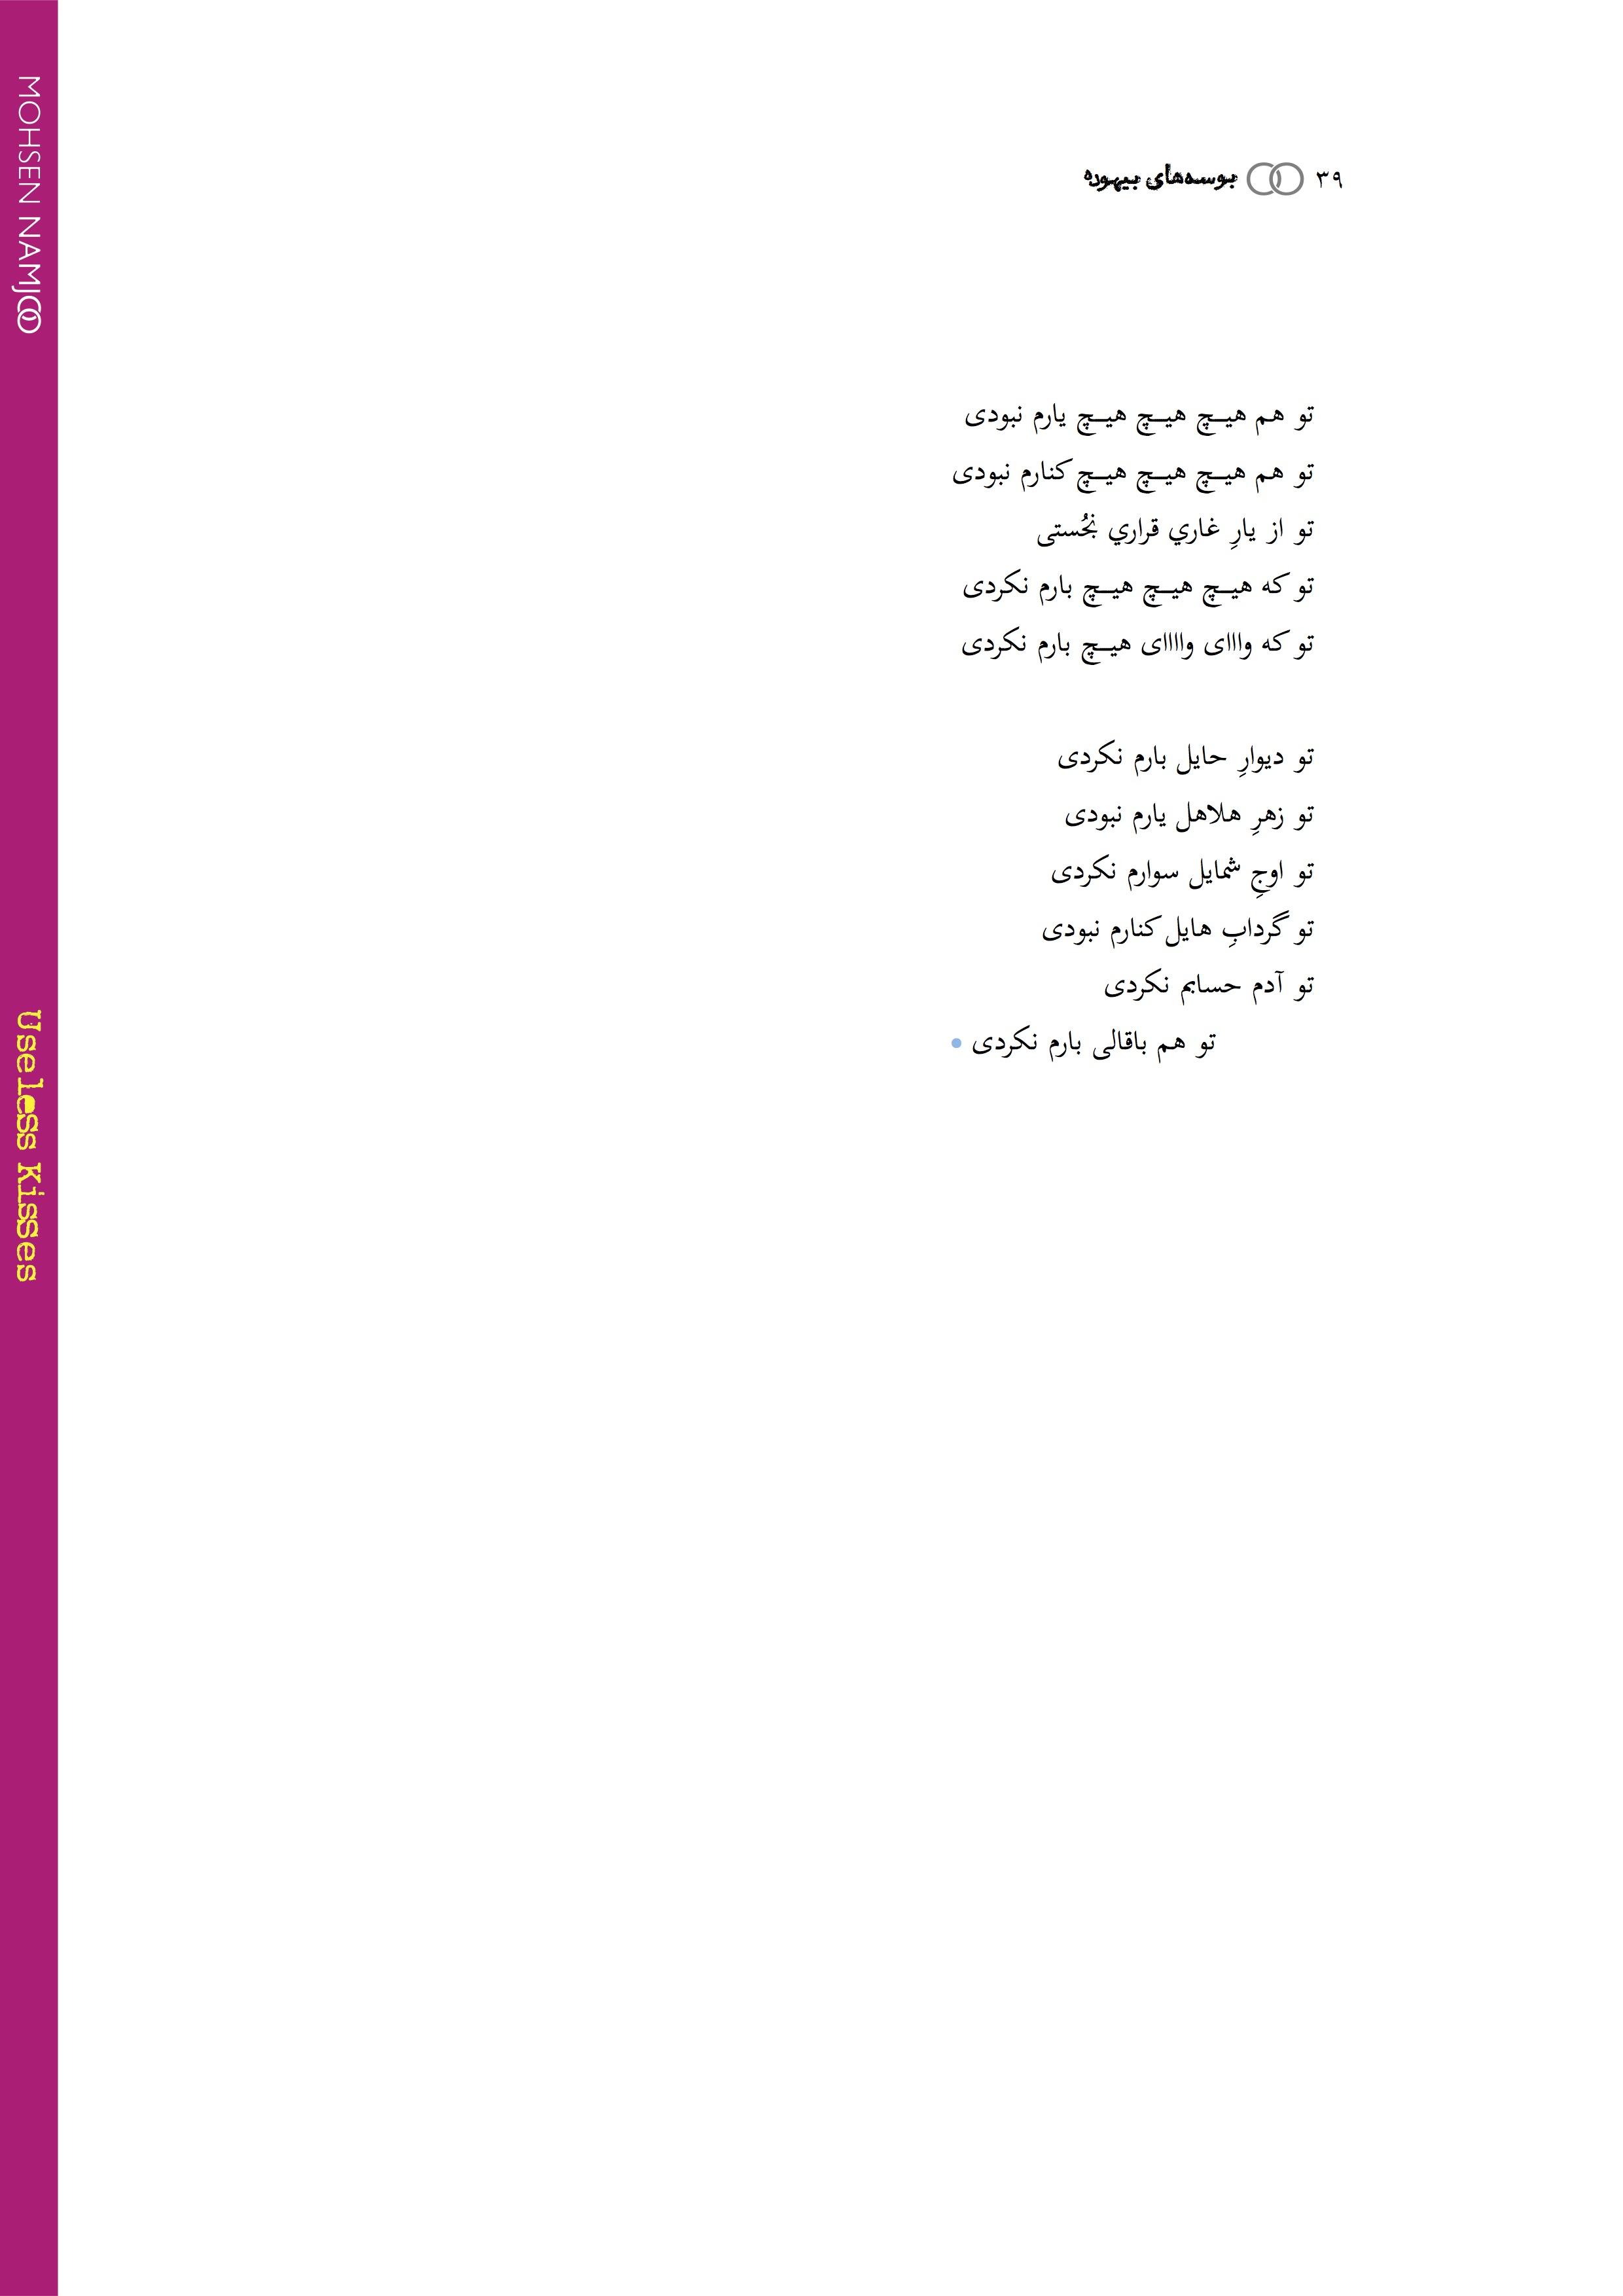 38Useless Kisses eBook (2nd Edition).jpg